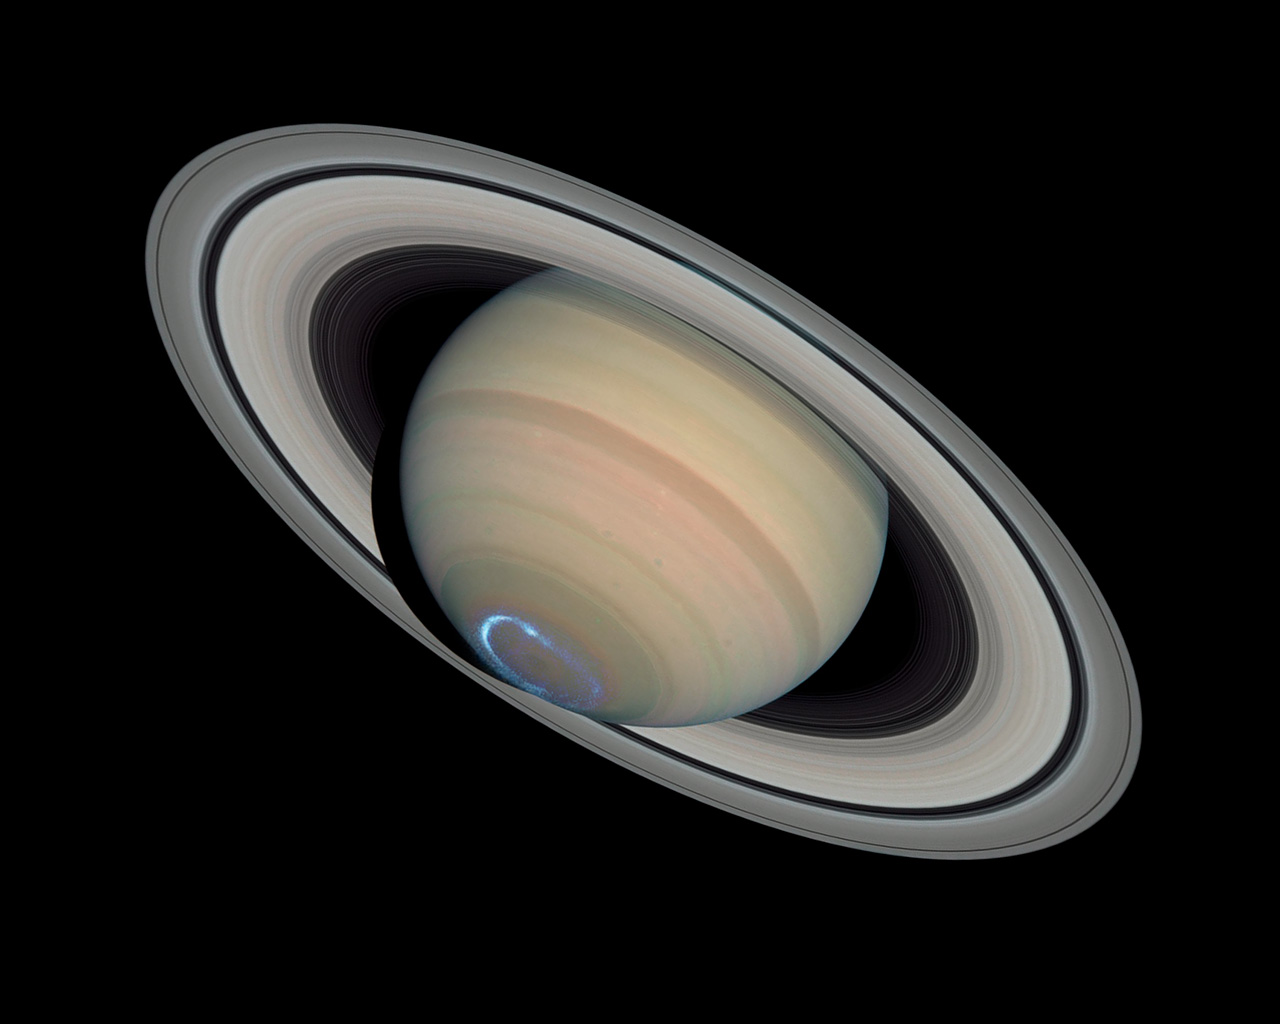 Saturn S Dynamic Aurorae 1 Jan 24 2004 Esa Hubble